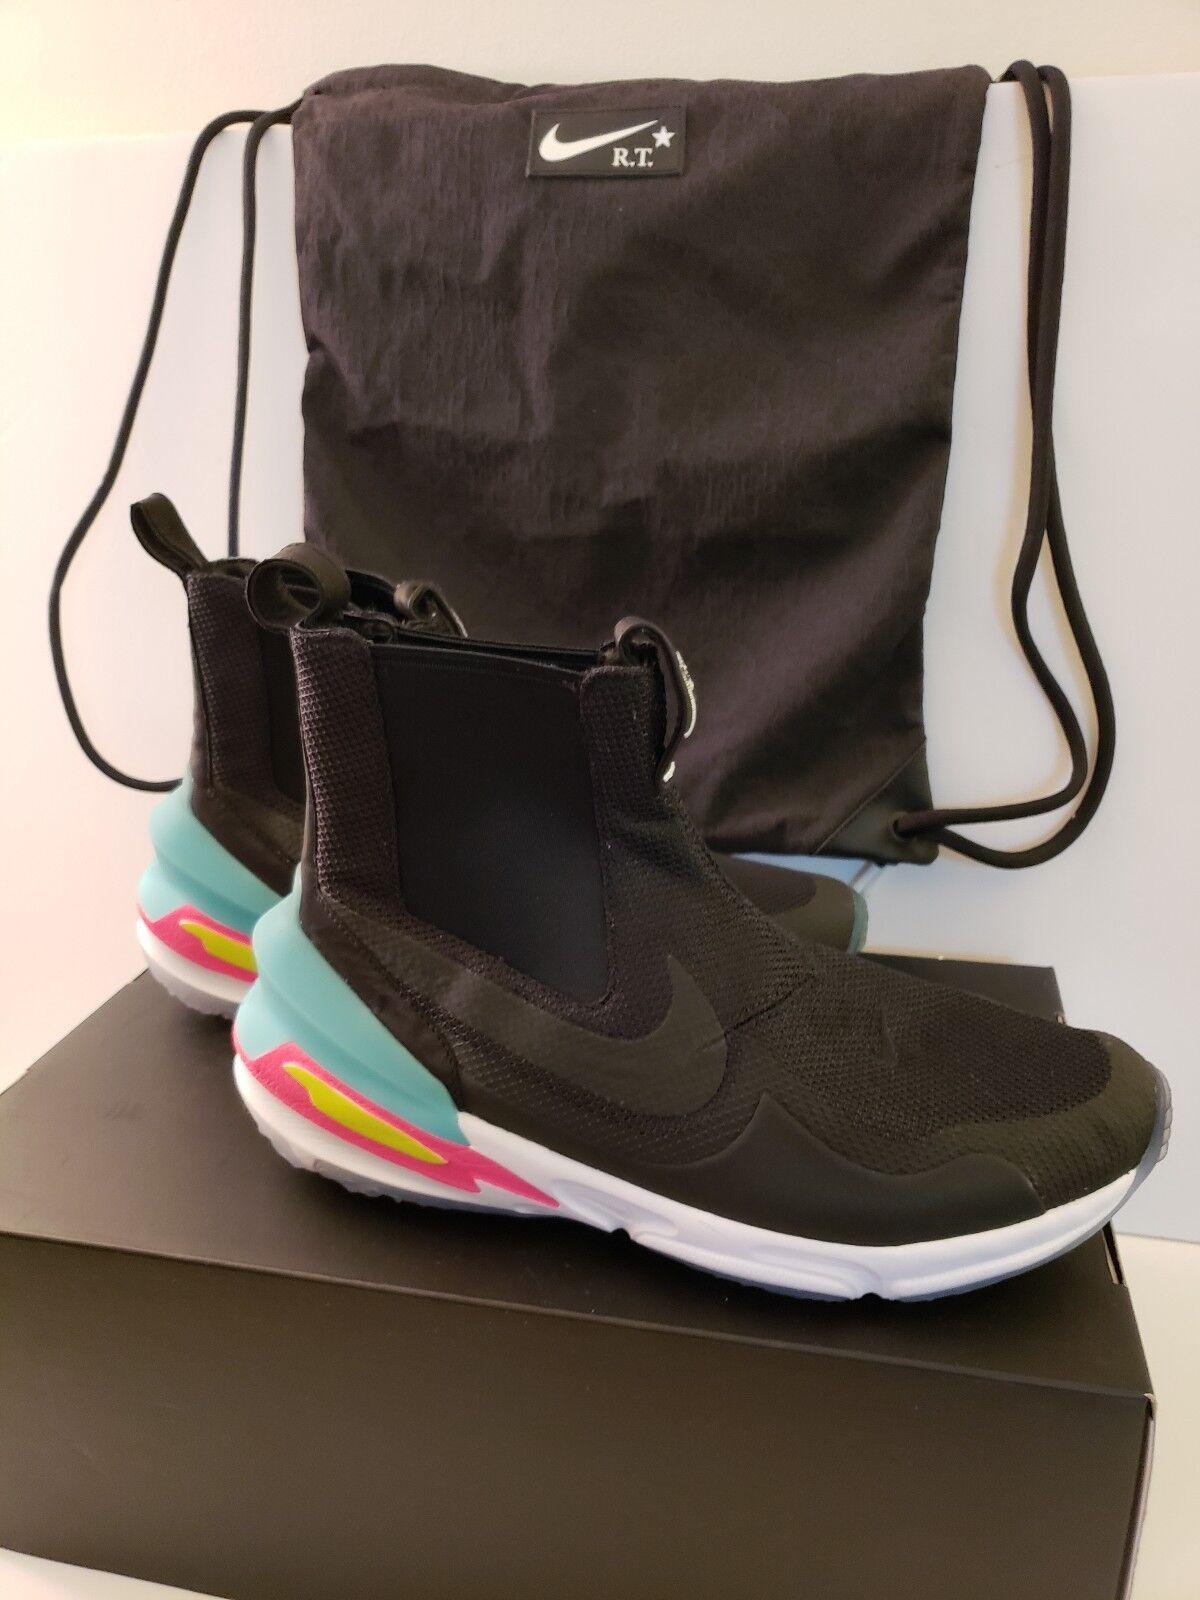 Nike Air Zoom Legend RT Size 8.5 & 9.5 Riccardo Tisci X NikeLab Boot 908458-002